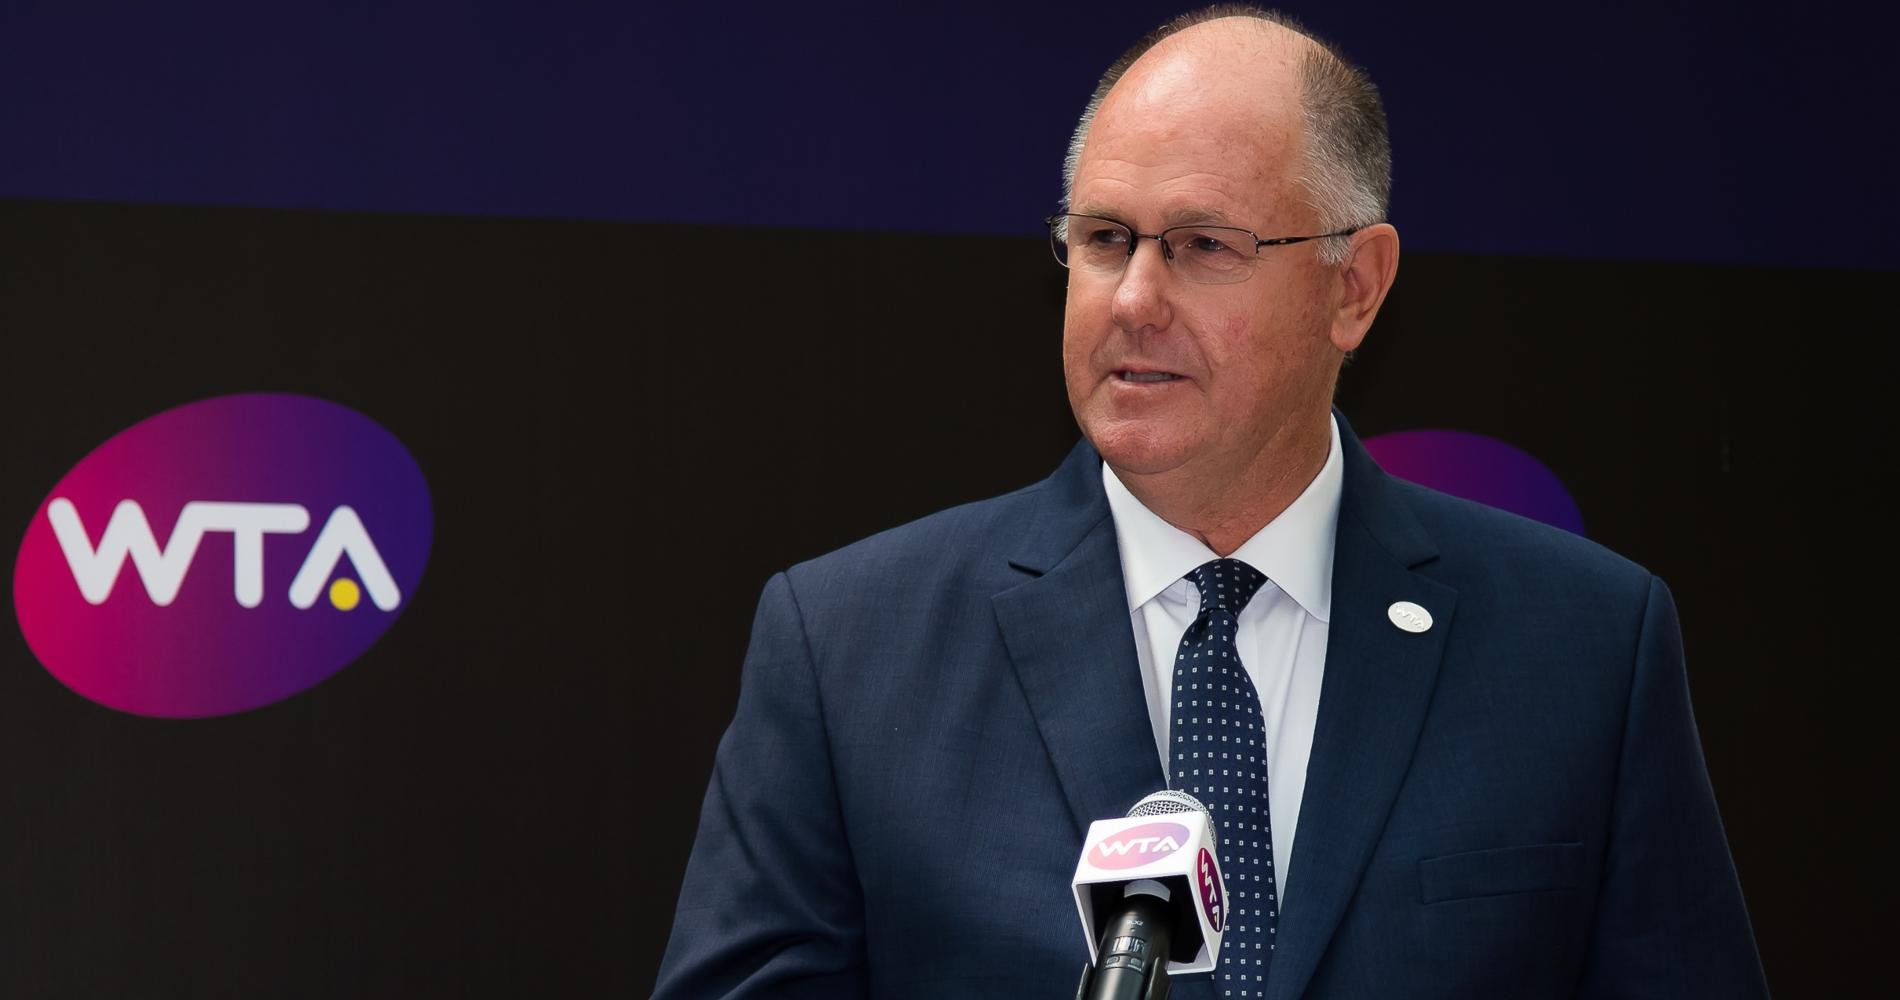 Steve Simon, WTA chairman